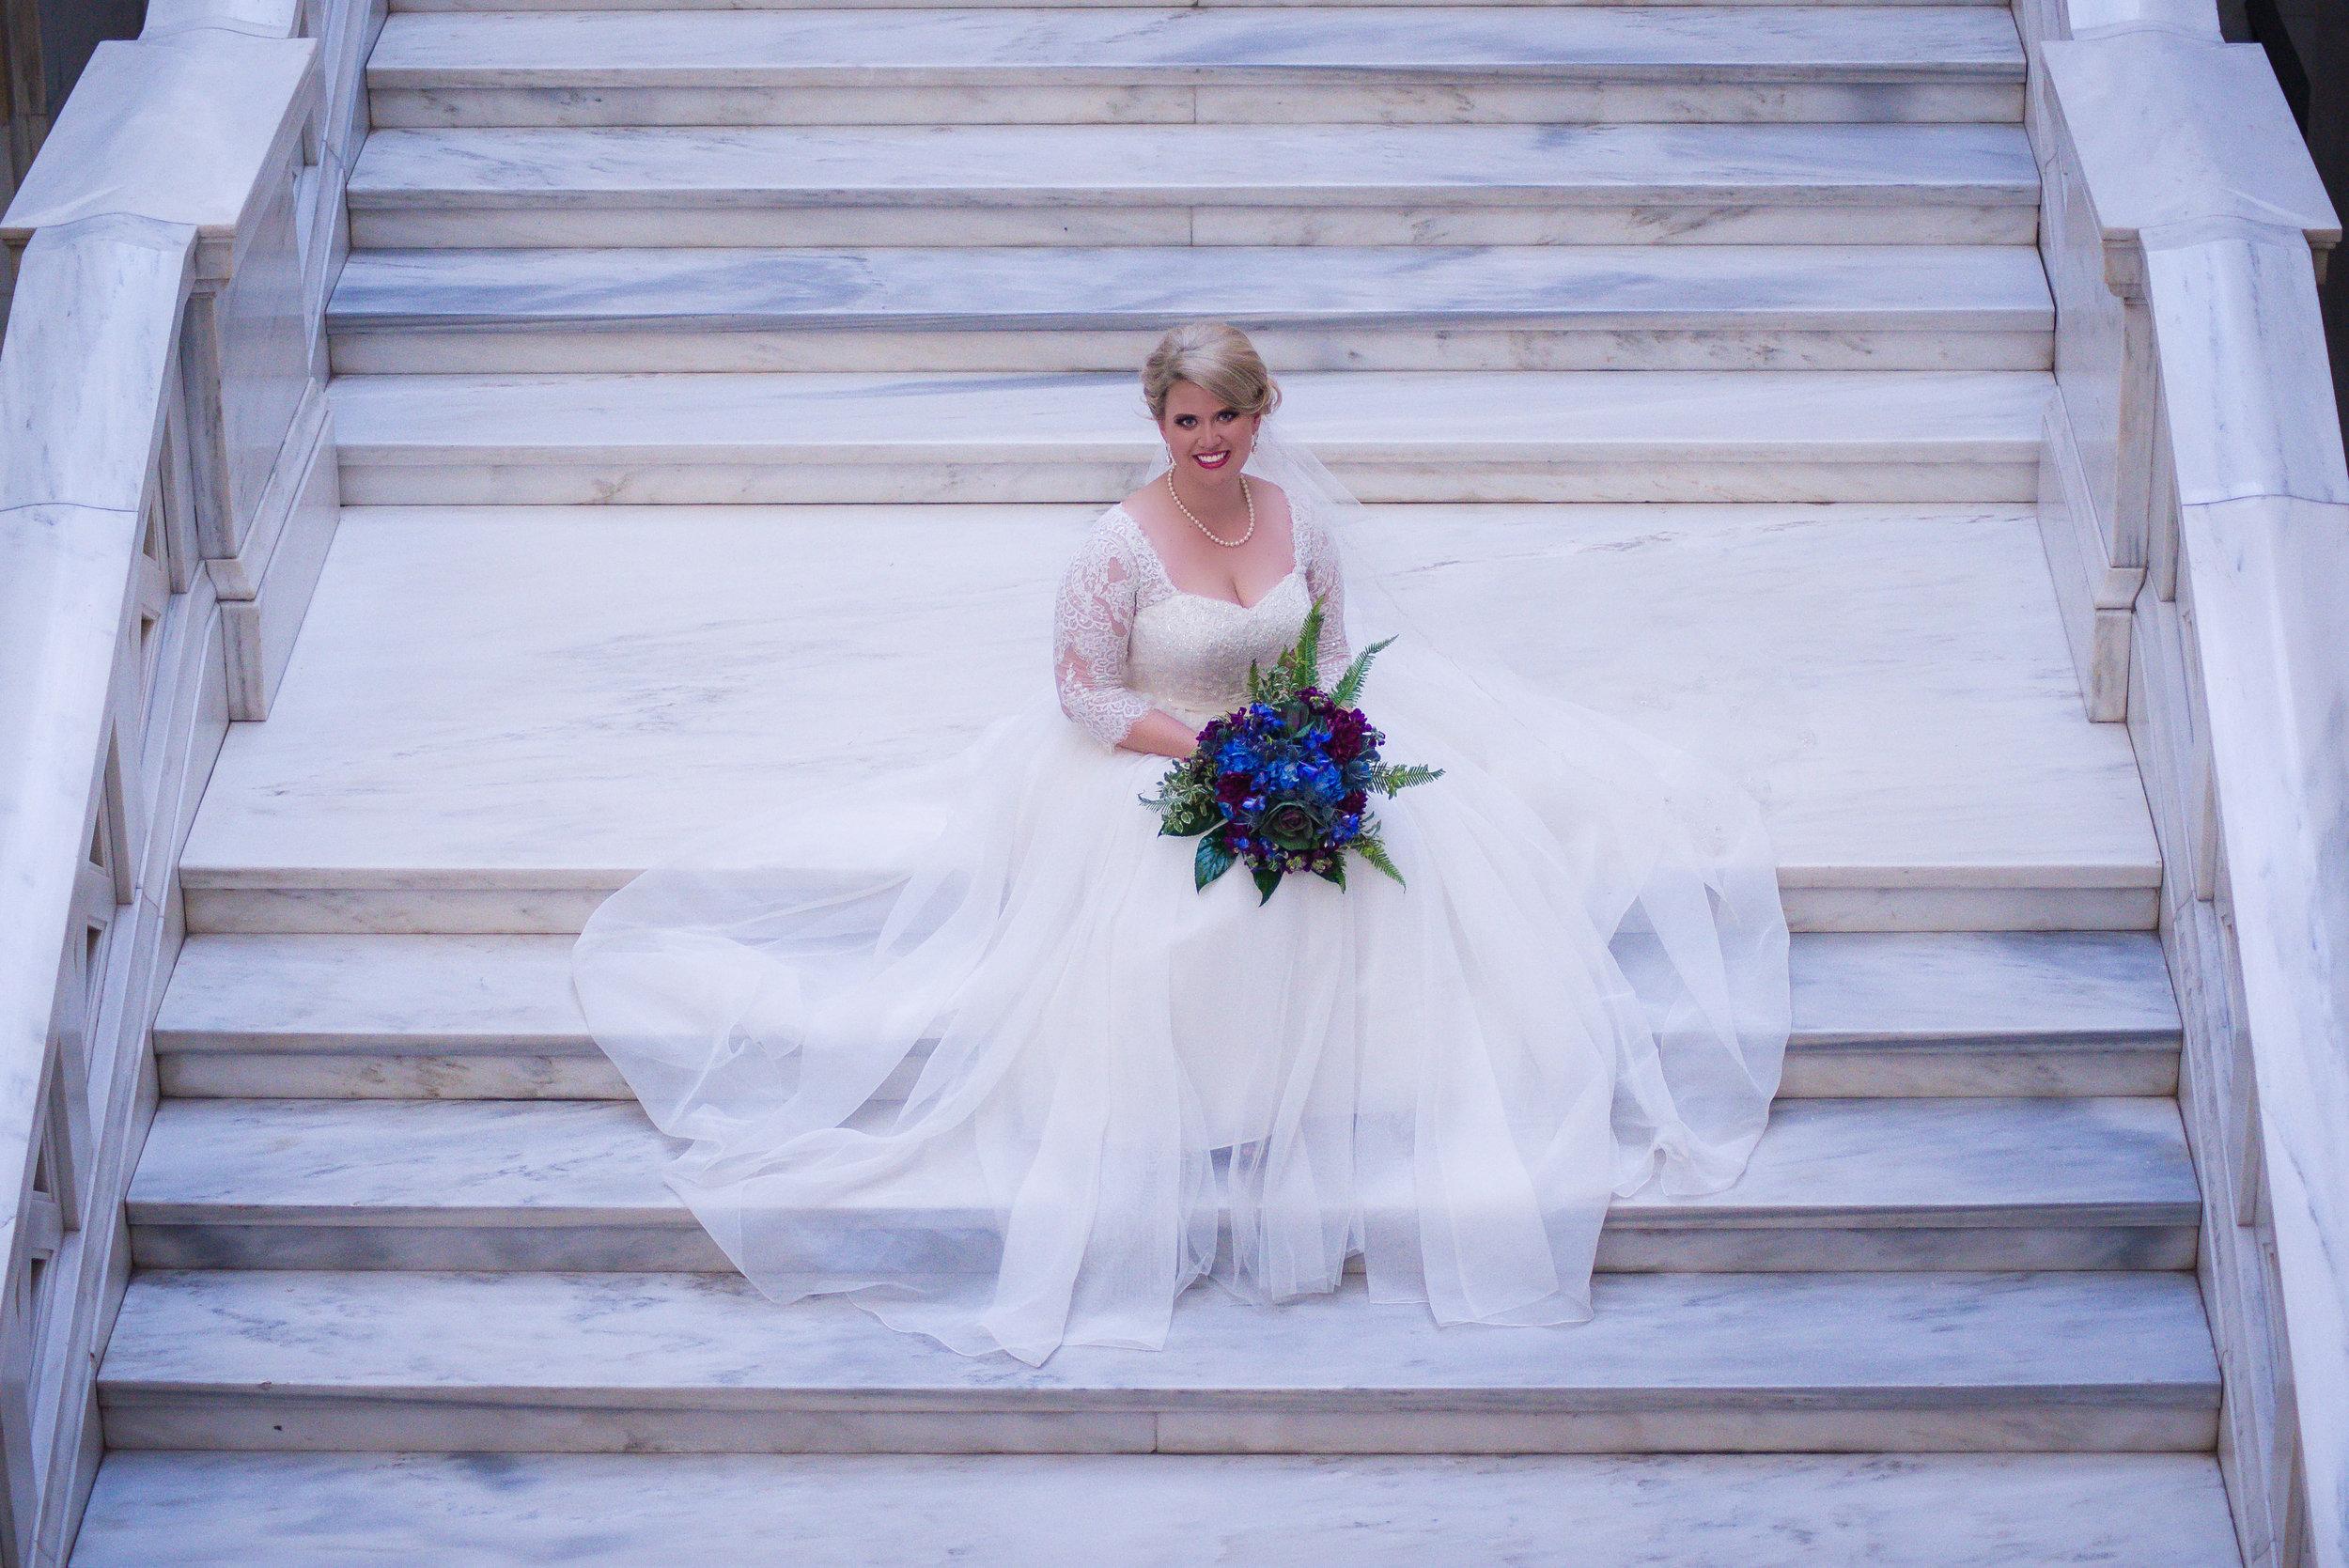 A Traditional Affair: Real Wedding